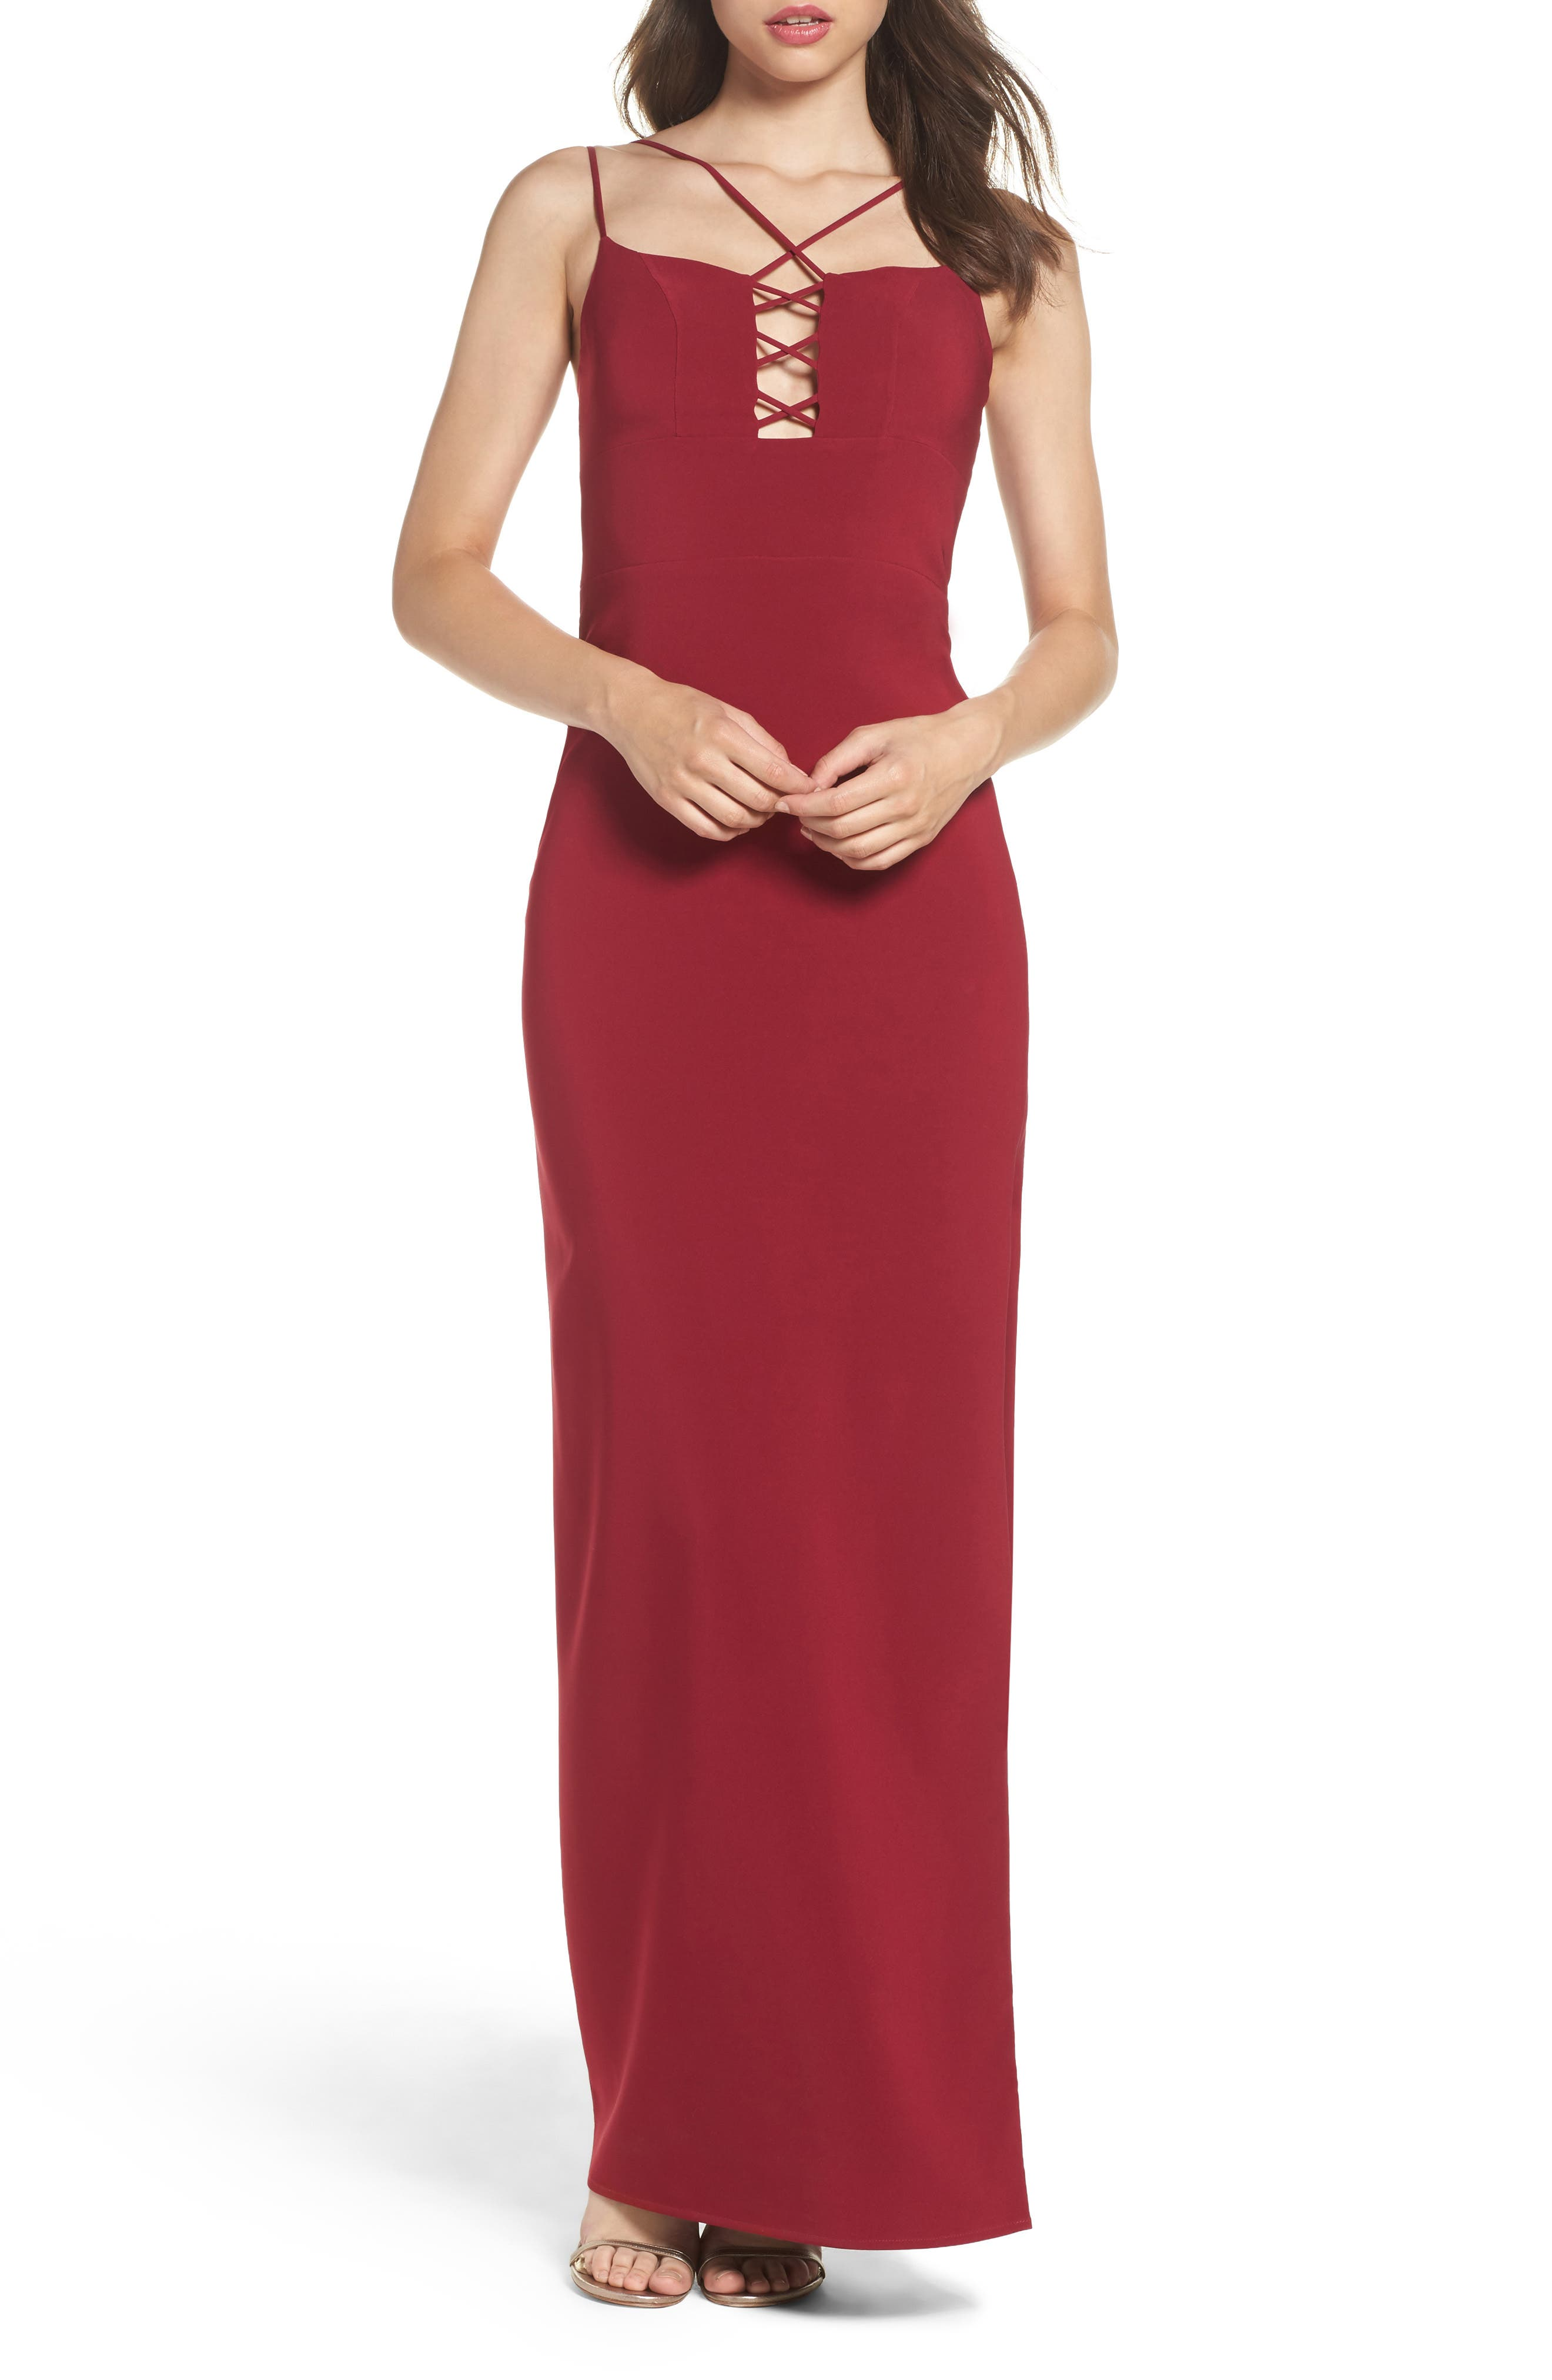 Starlett Gown,                         Main,                         color, Wine